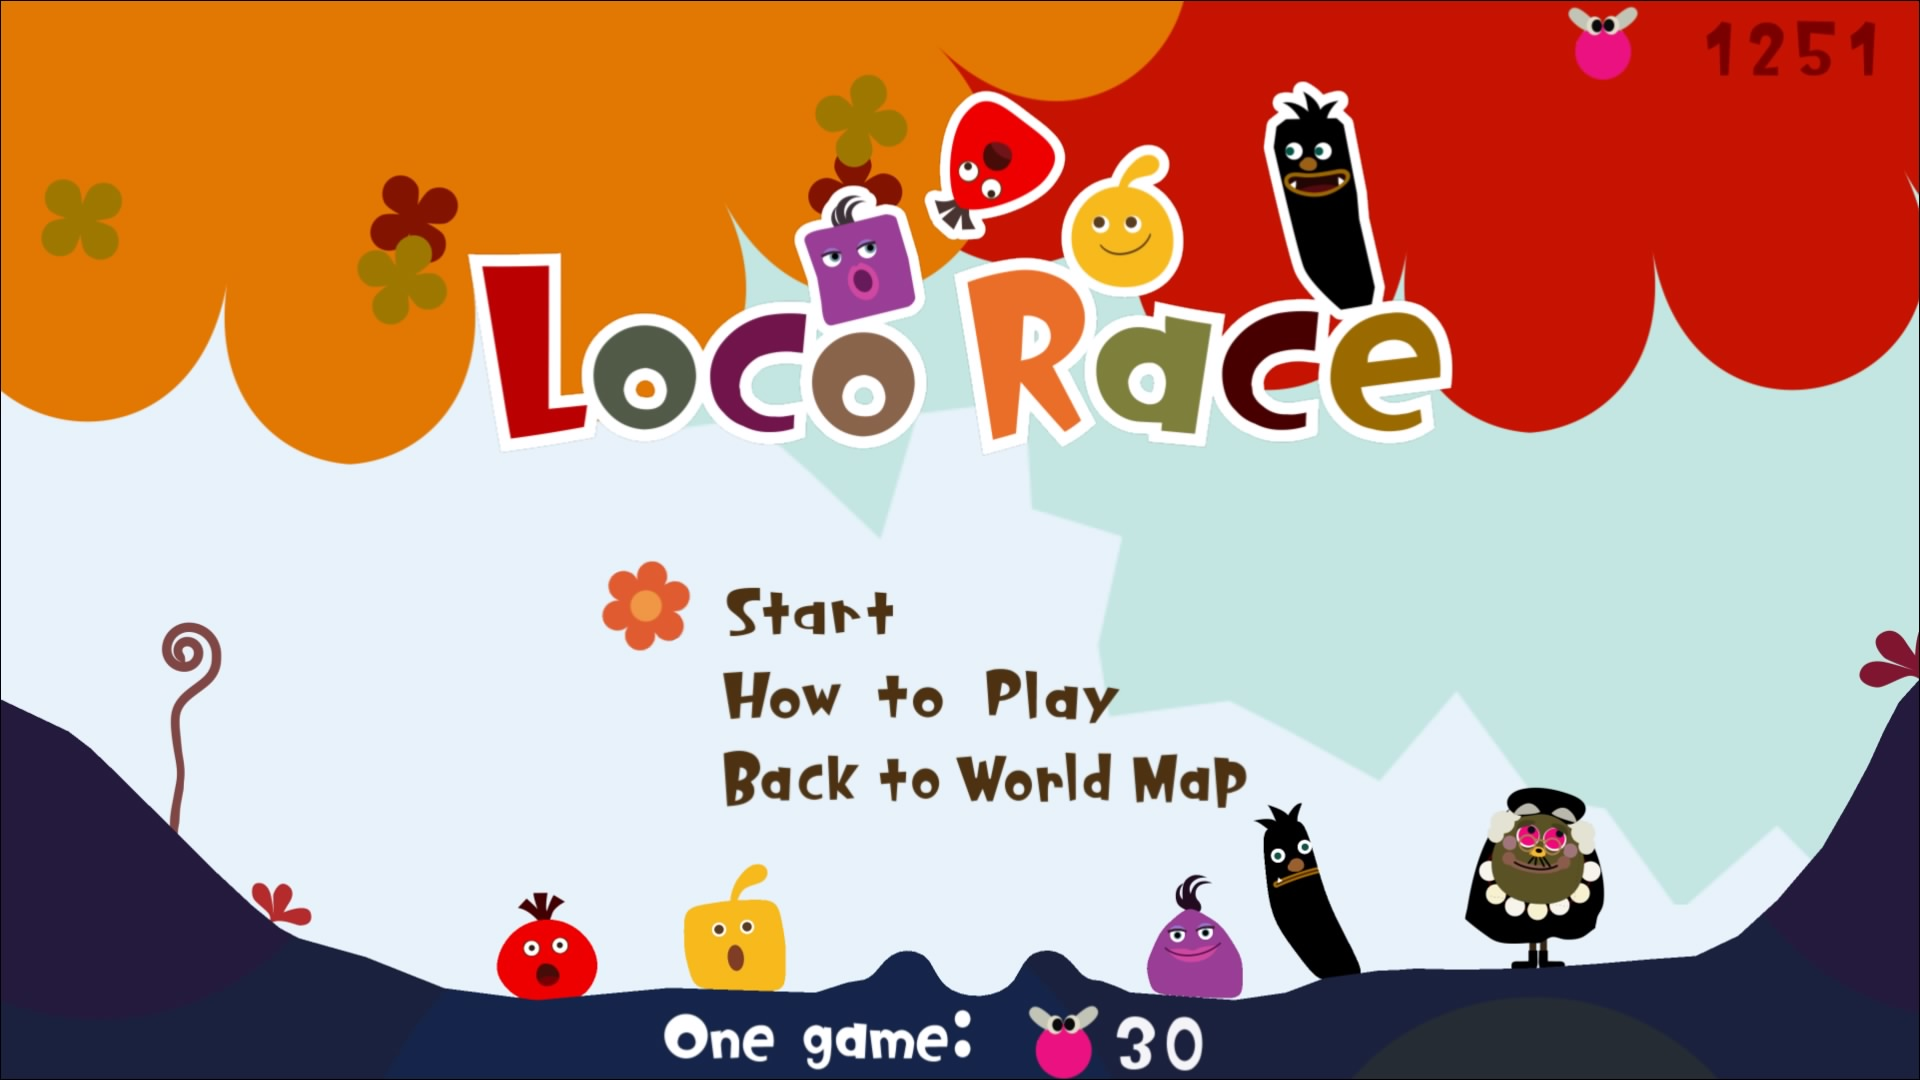 locoroco2 review